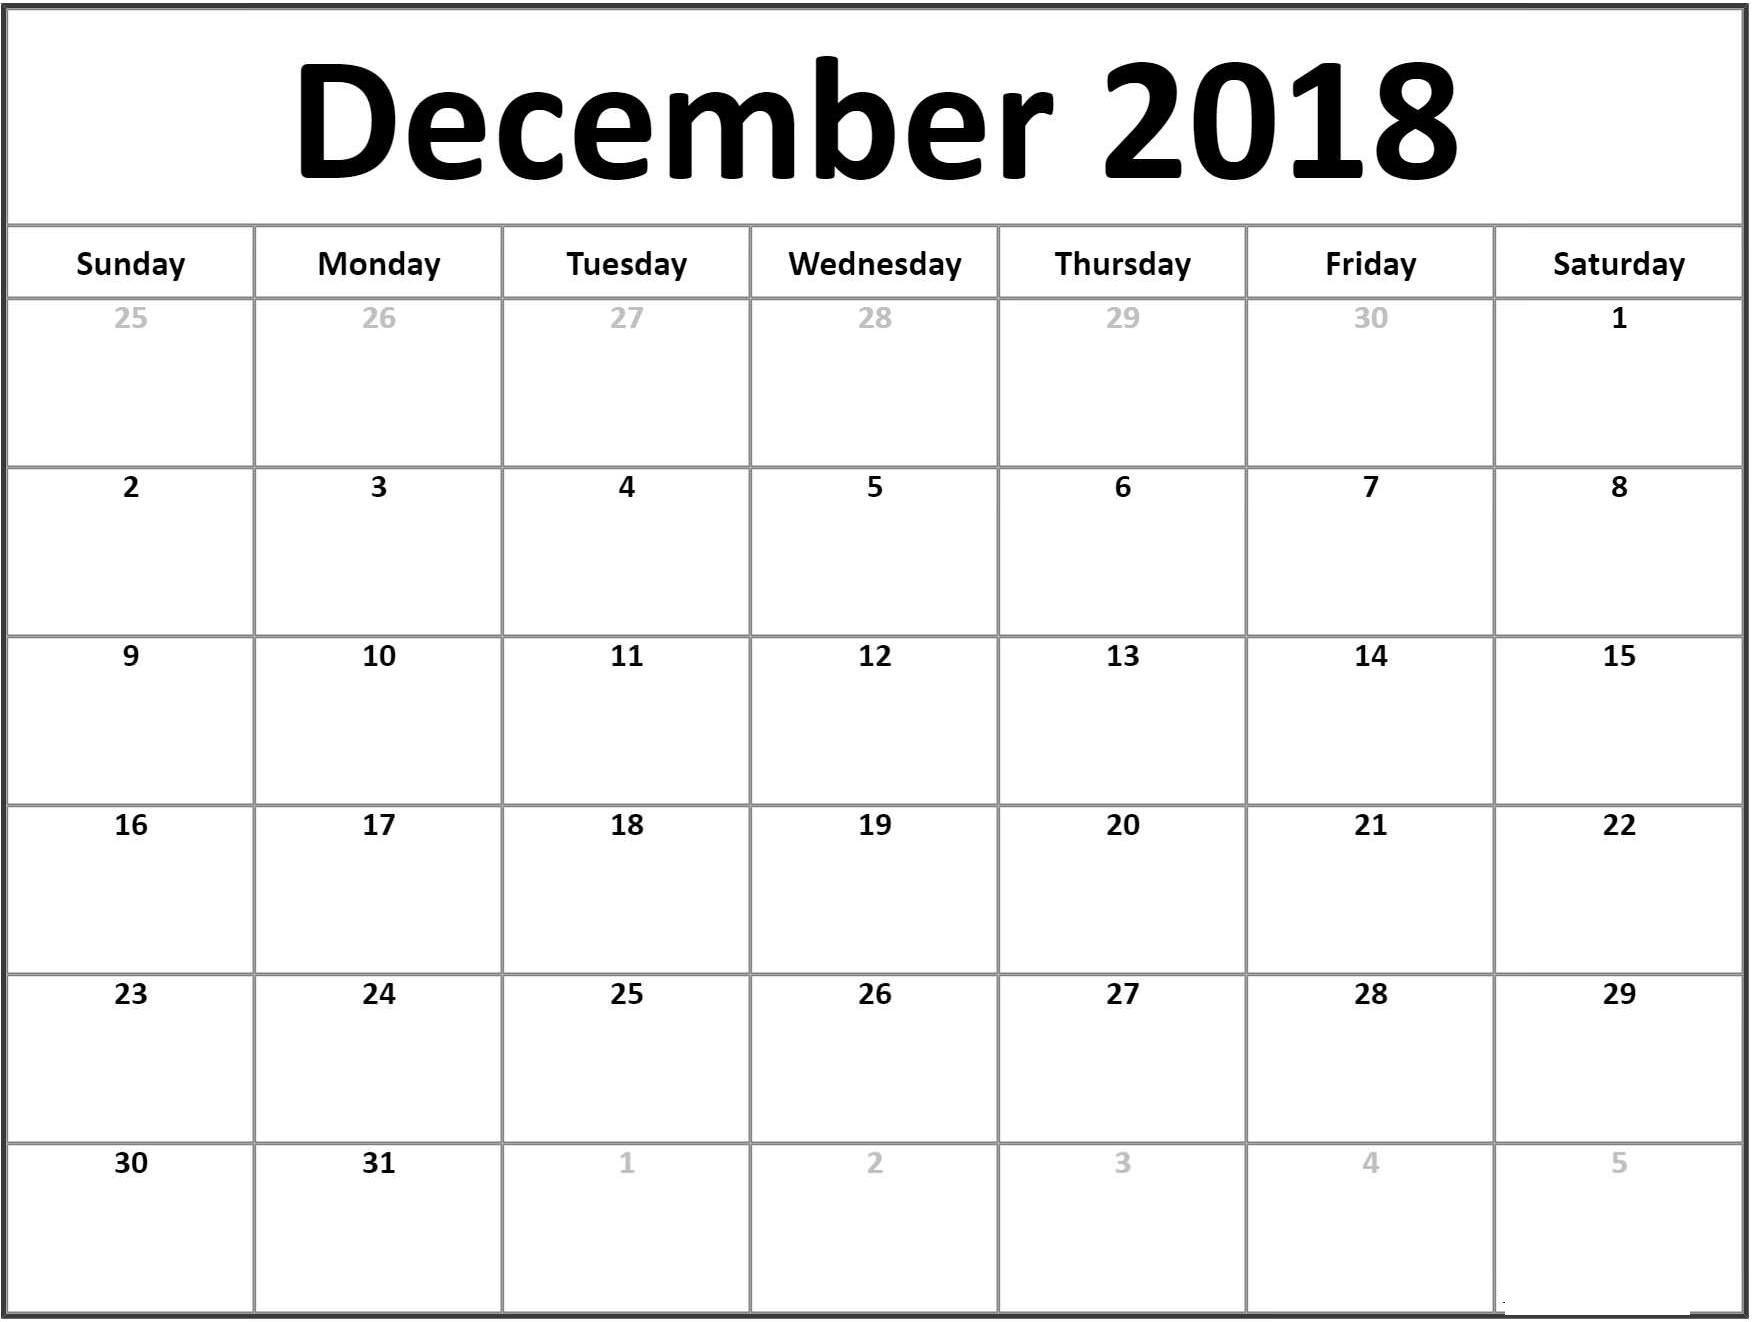 December Calendar 2018 Printable Pages Calendardecember2018